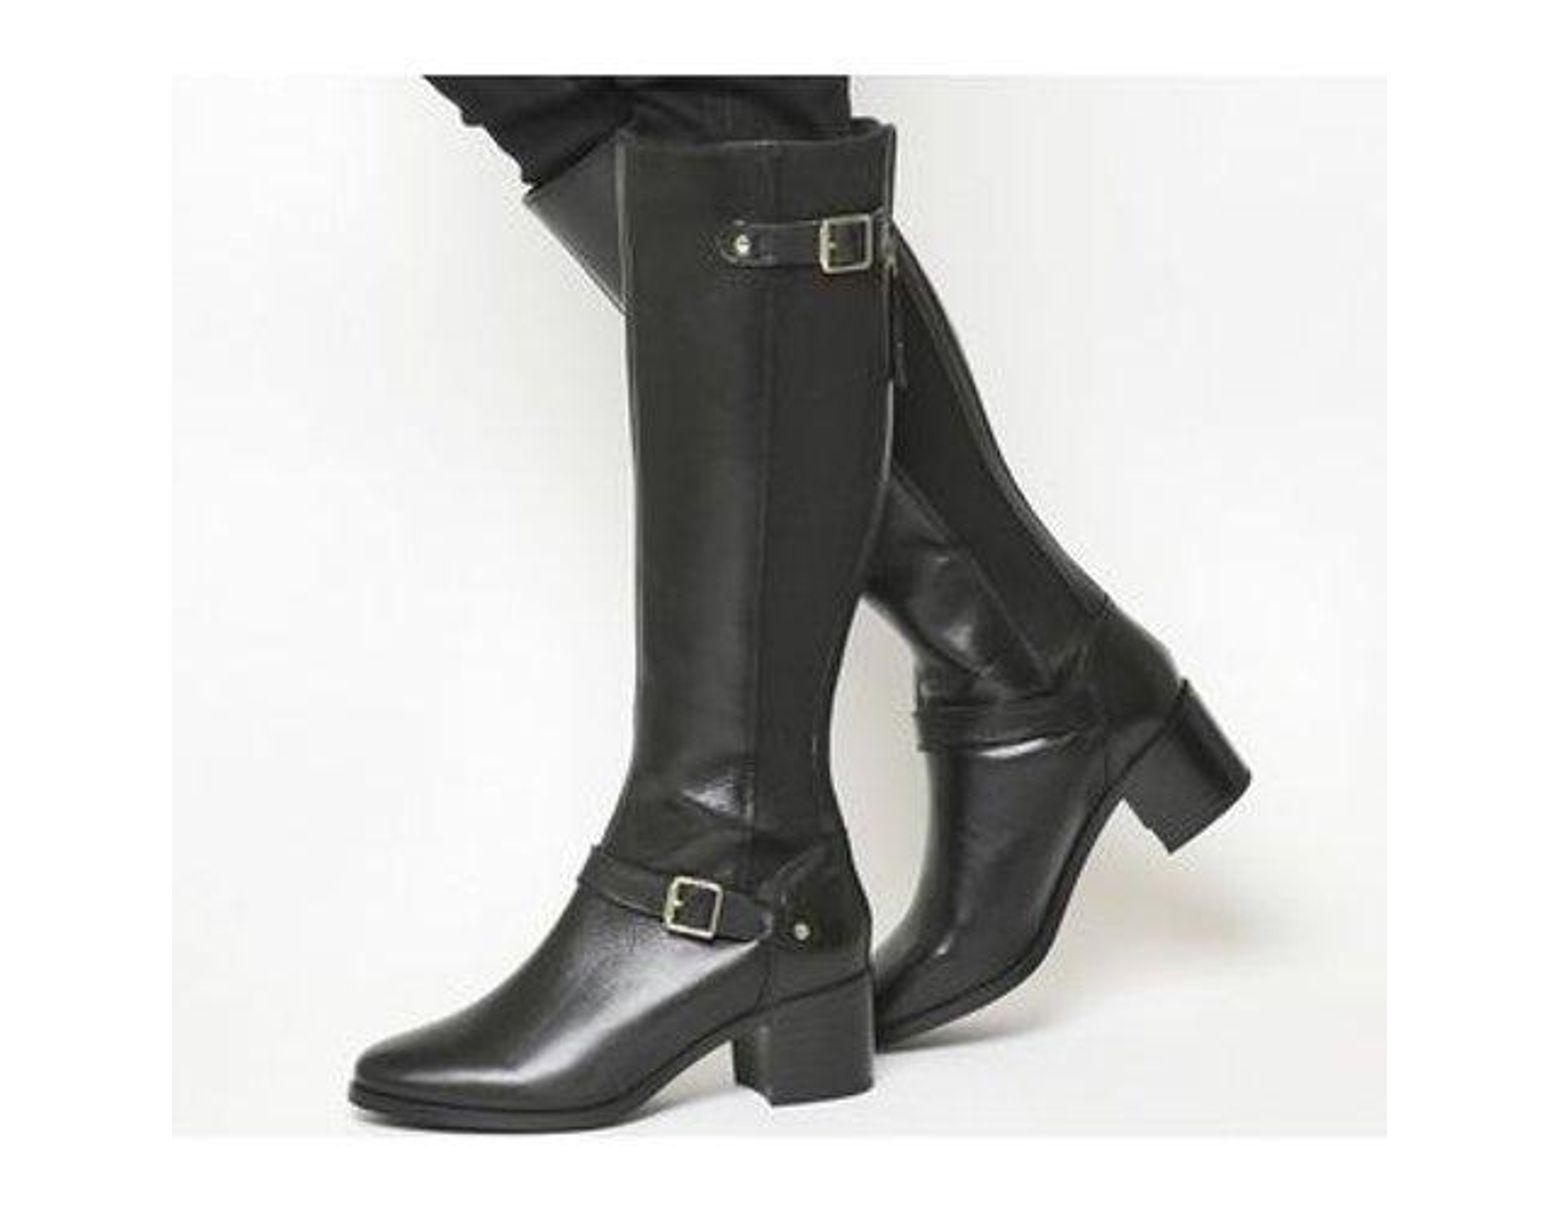 74f86cdec3a Women's Black Kestrel- Mid Heel Riding Boot